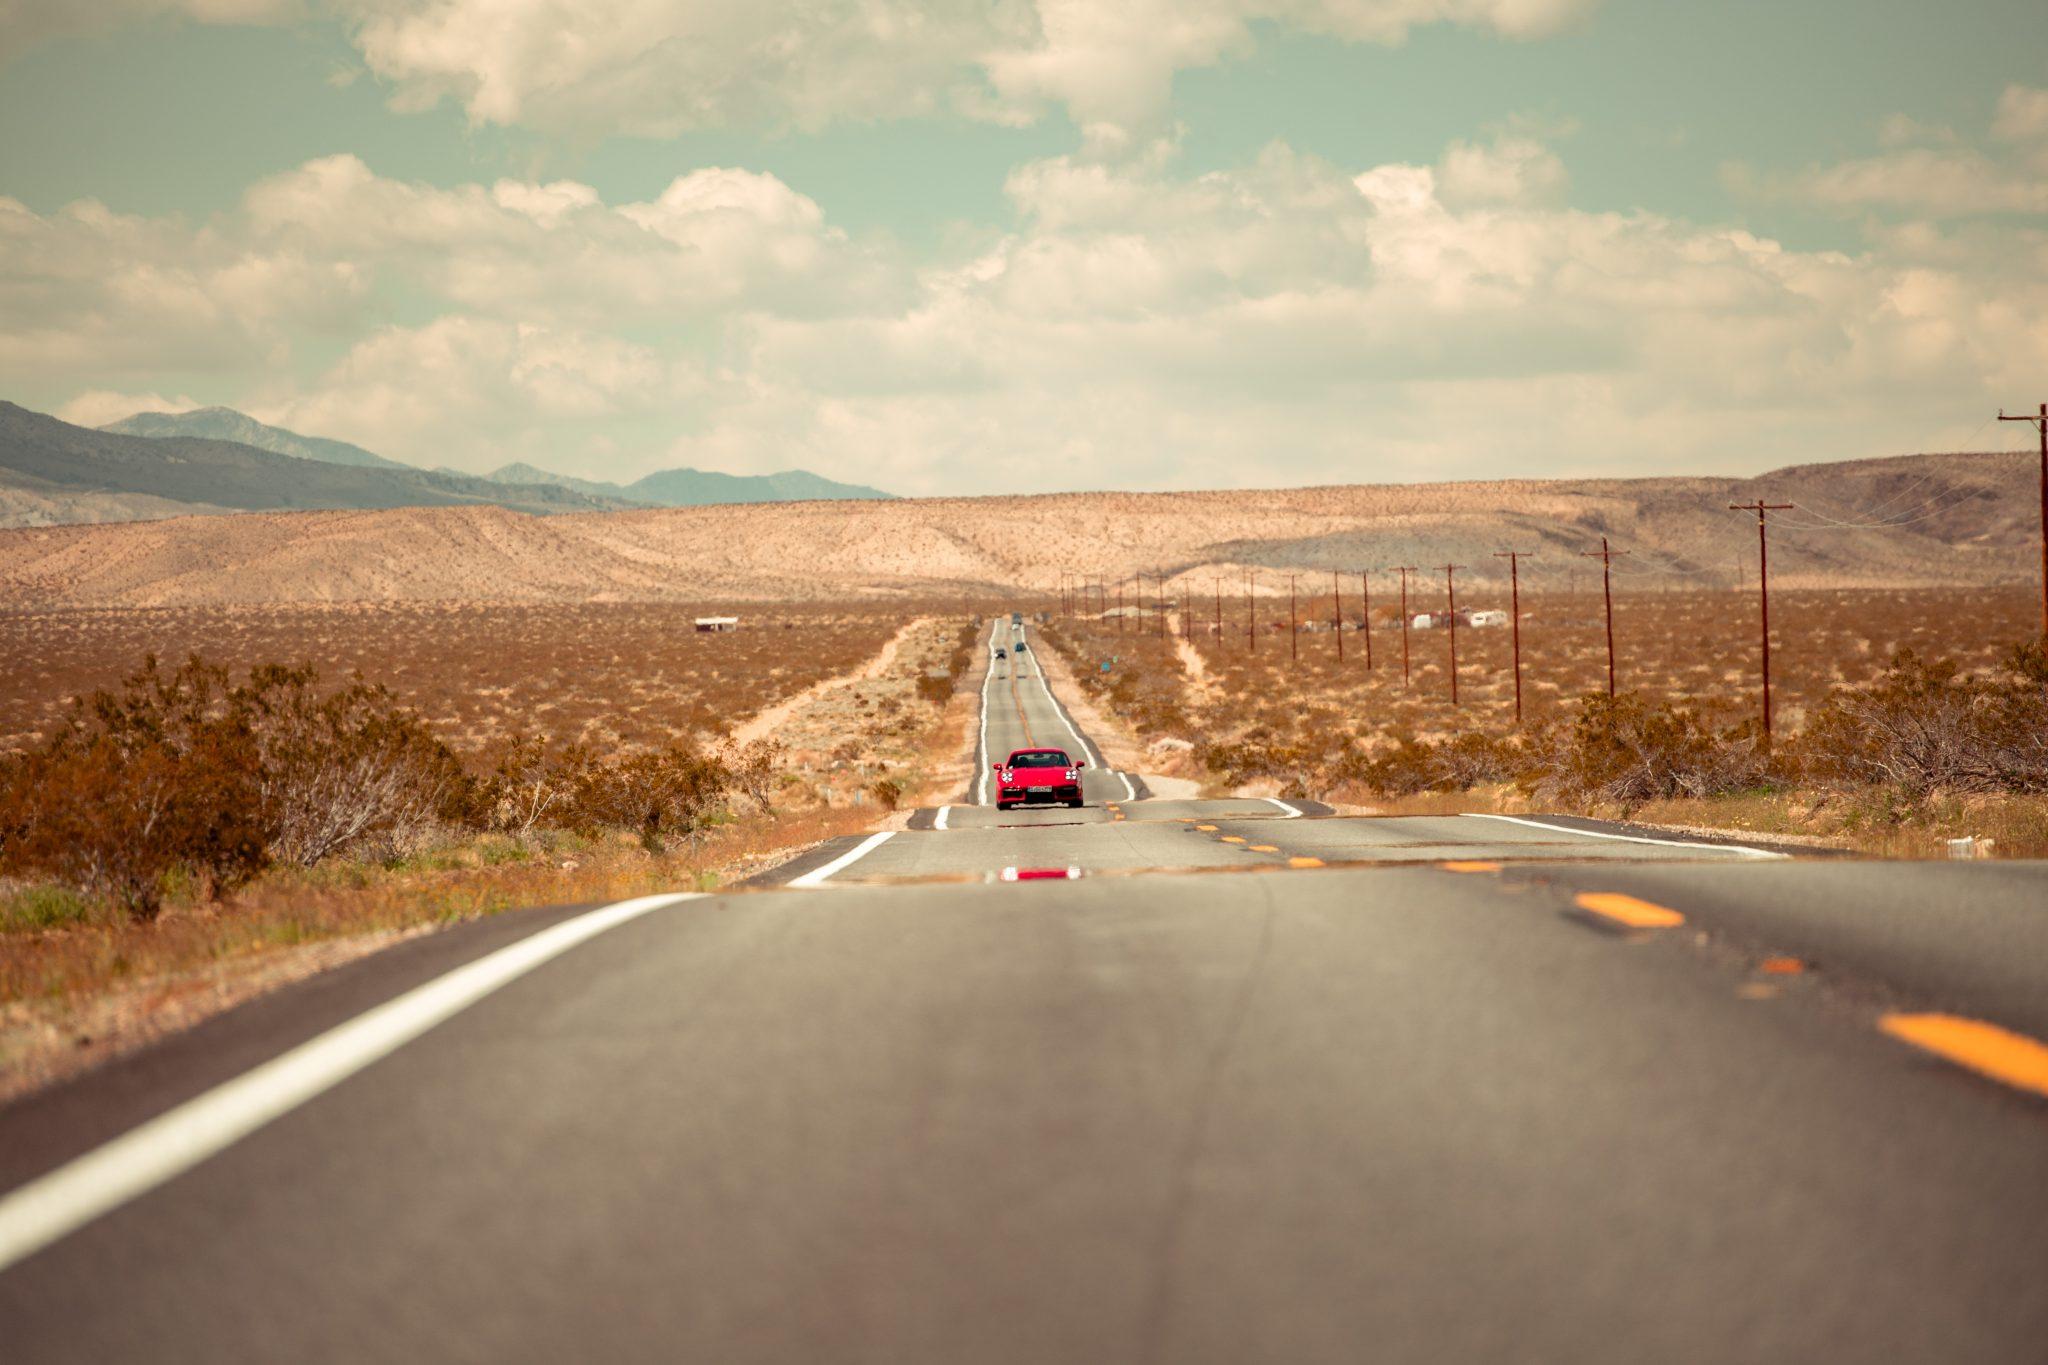 Porsche 911 Turbo S (992) op woestijnweg (snelweg)